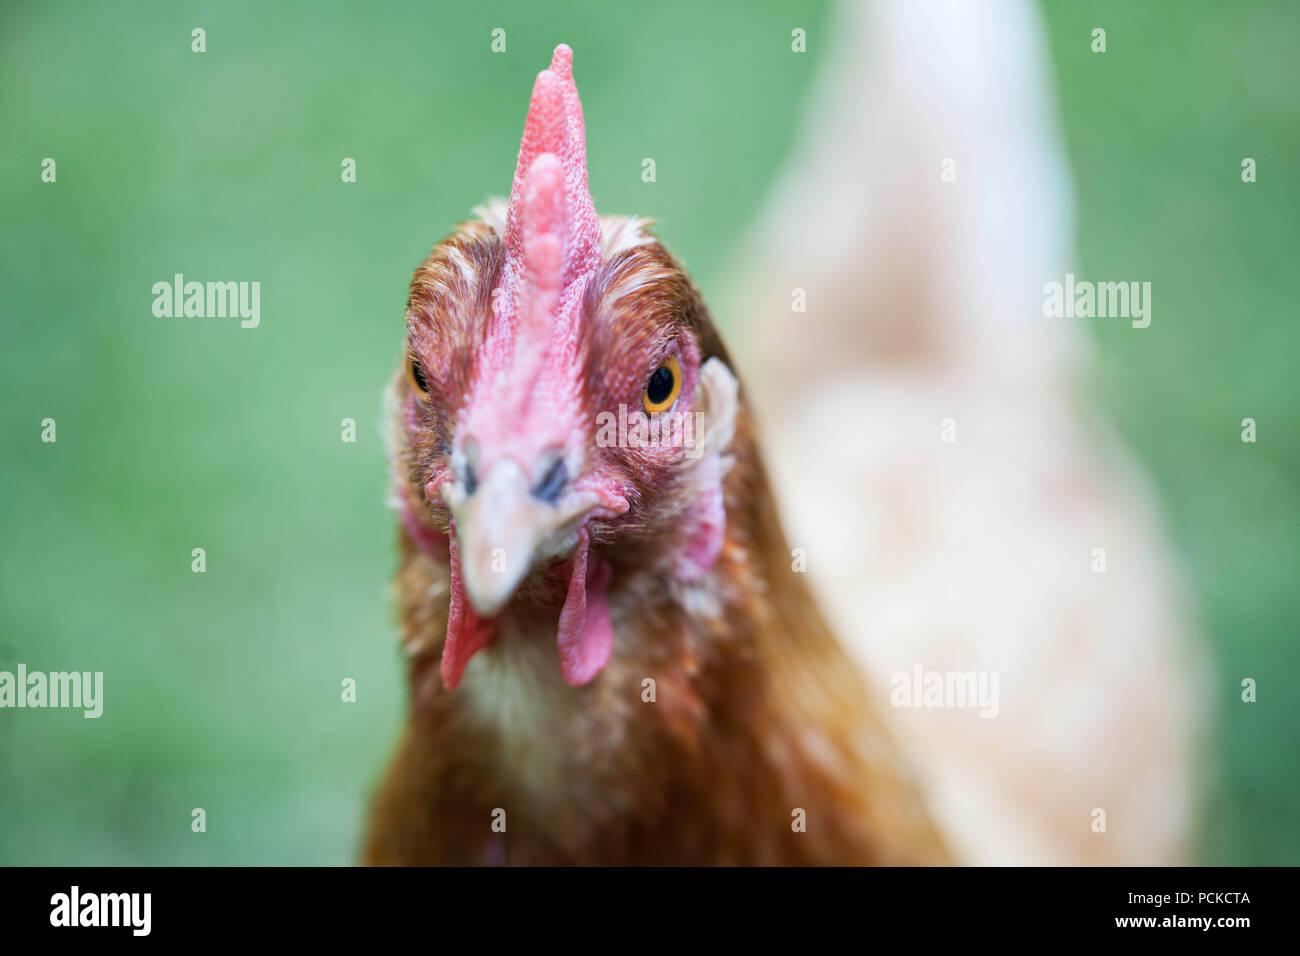 Backyard Chickens Hybrid Breeds - Stock Image